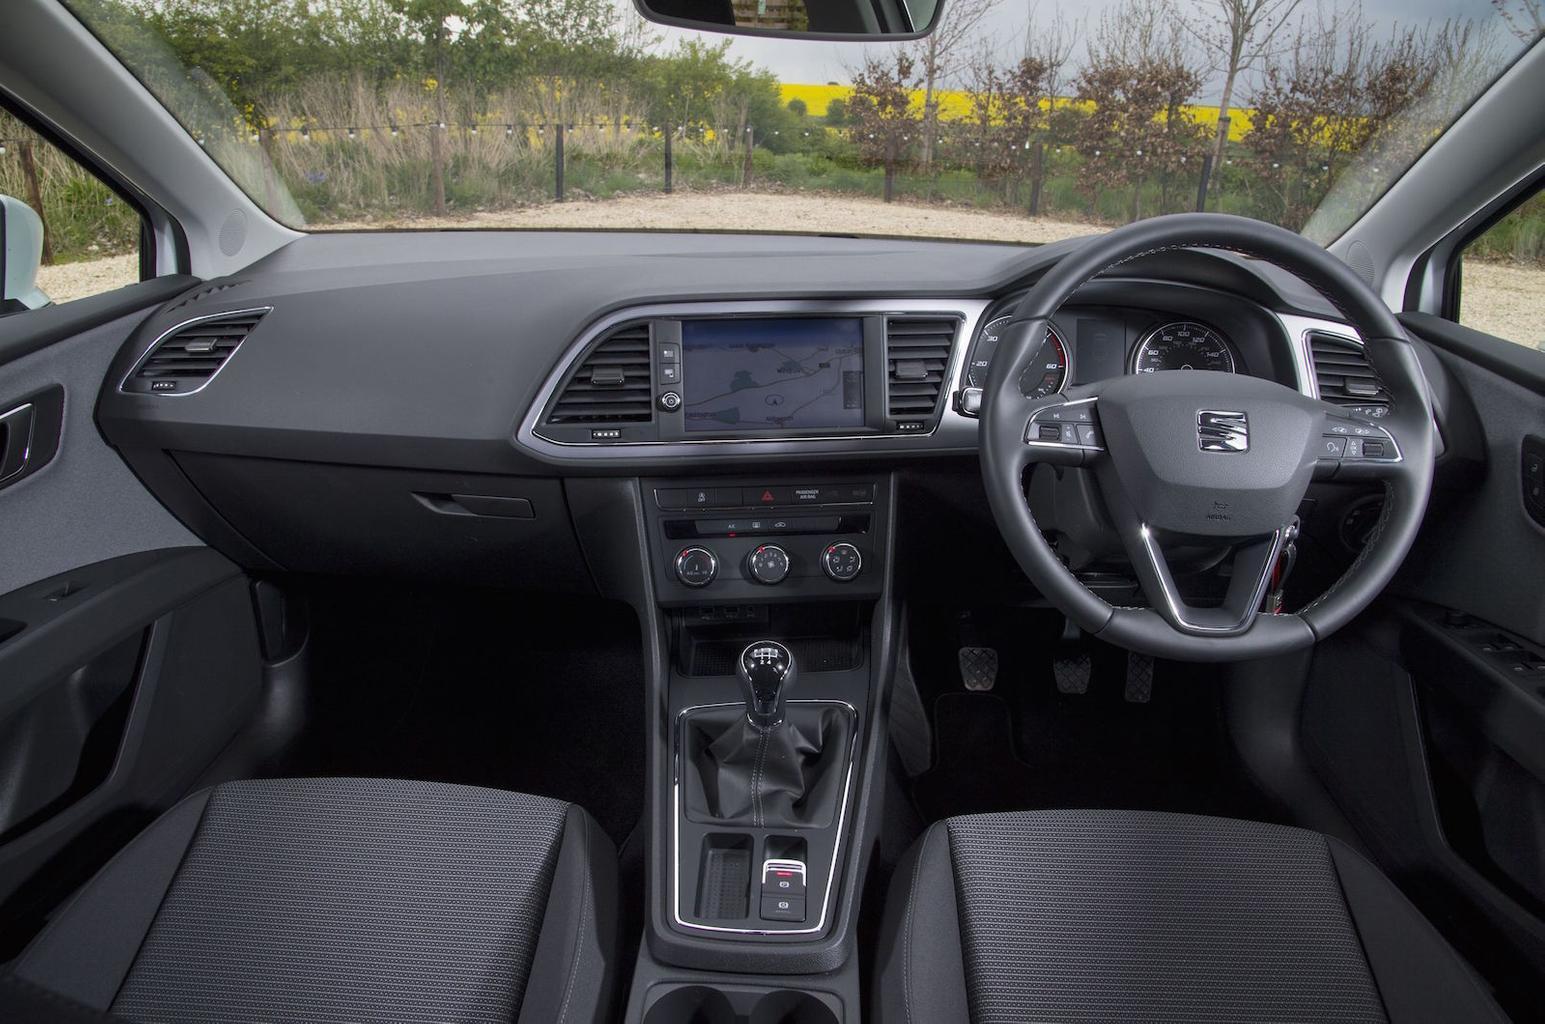 Seat Leon 1.5 TSI Evo SE - interior